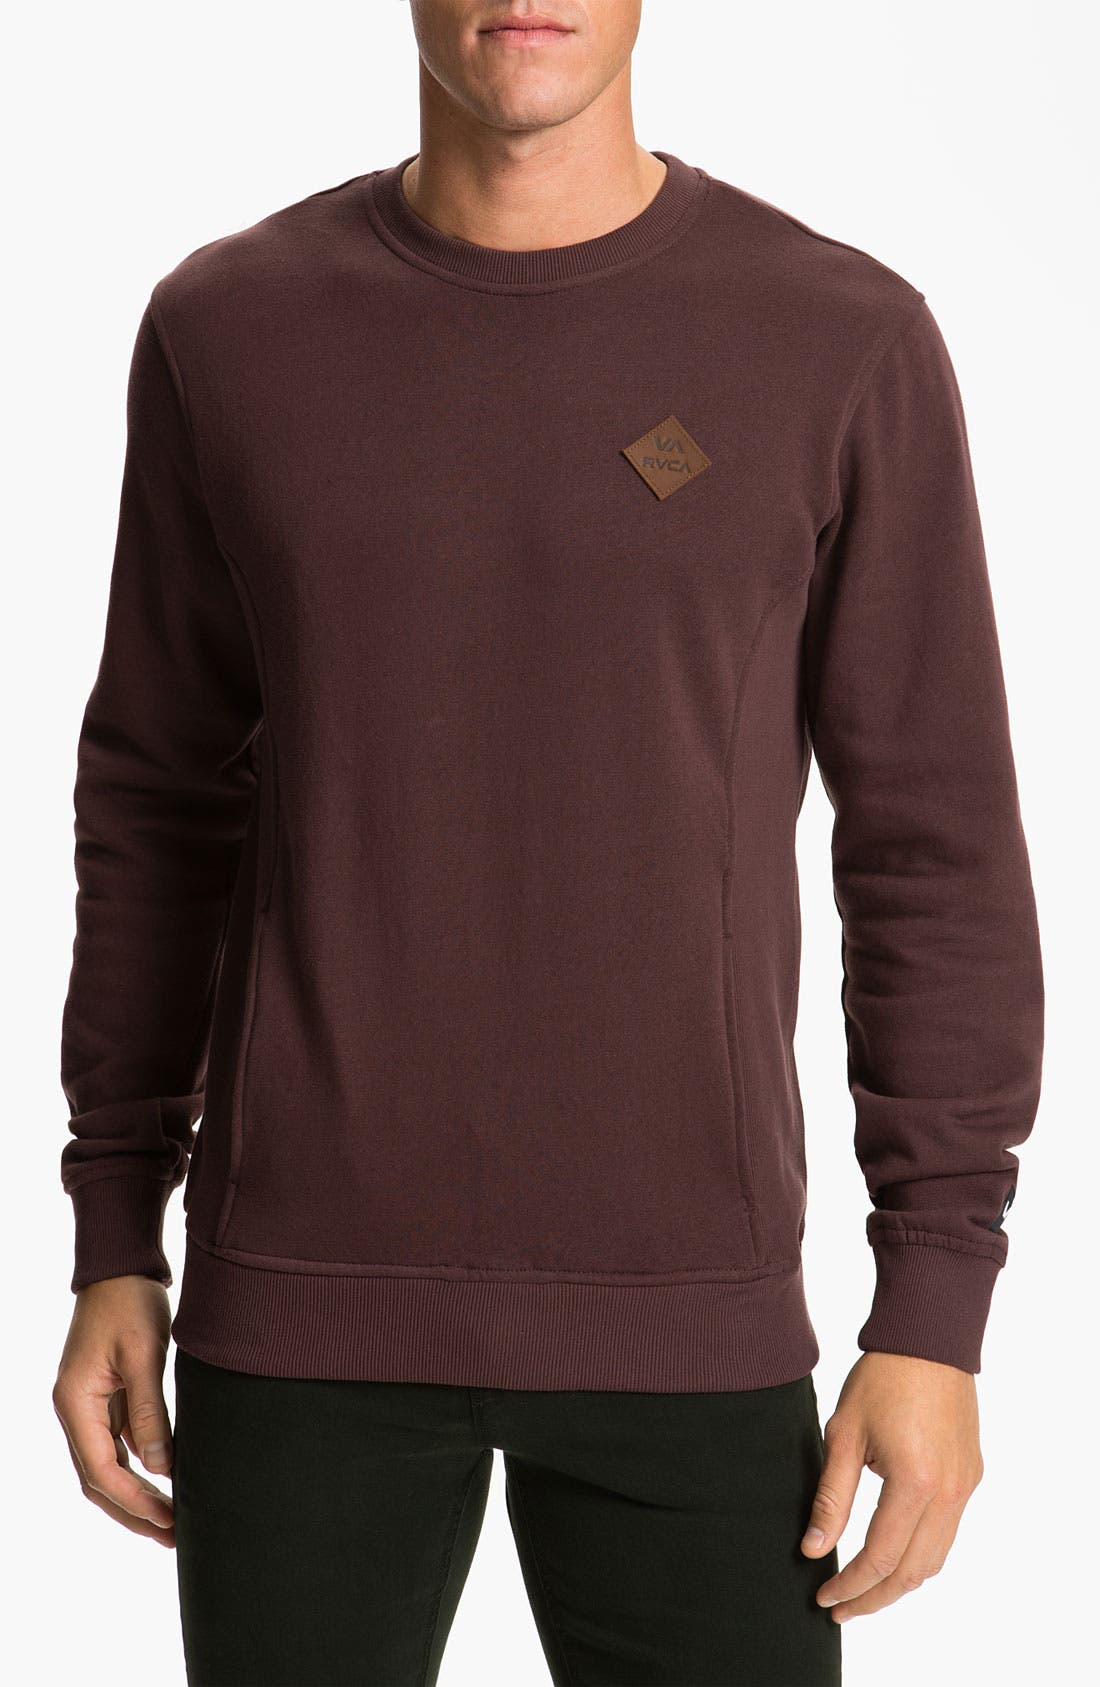 Alternate Image 1 Selected - RVCA 'Delux' Crewneck Sweatshirt